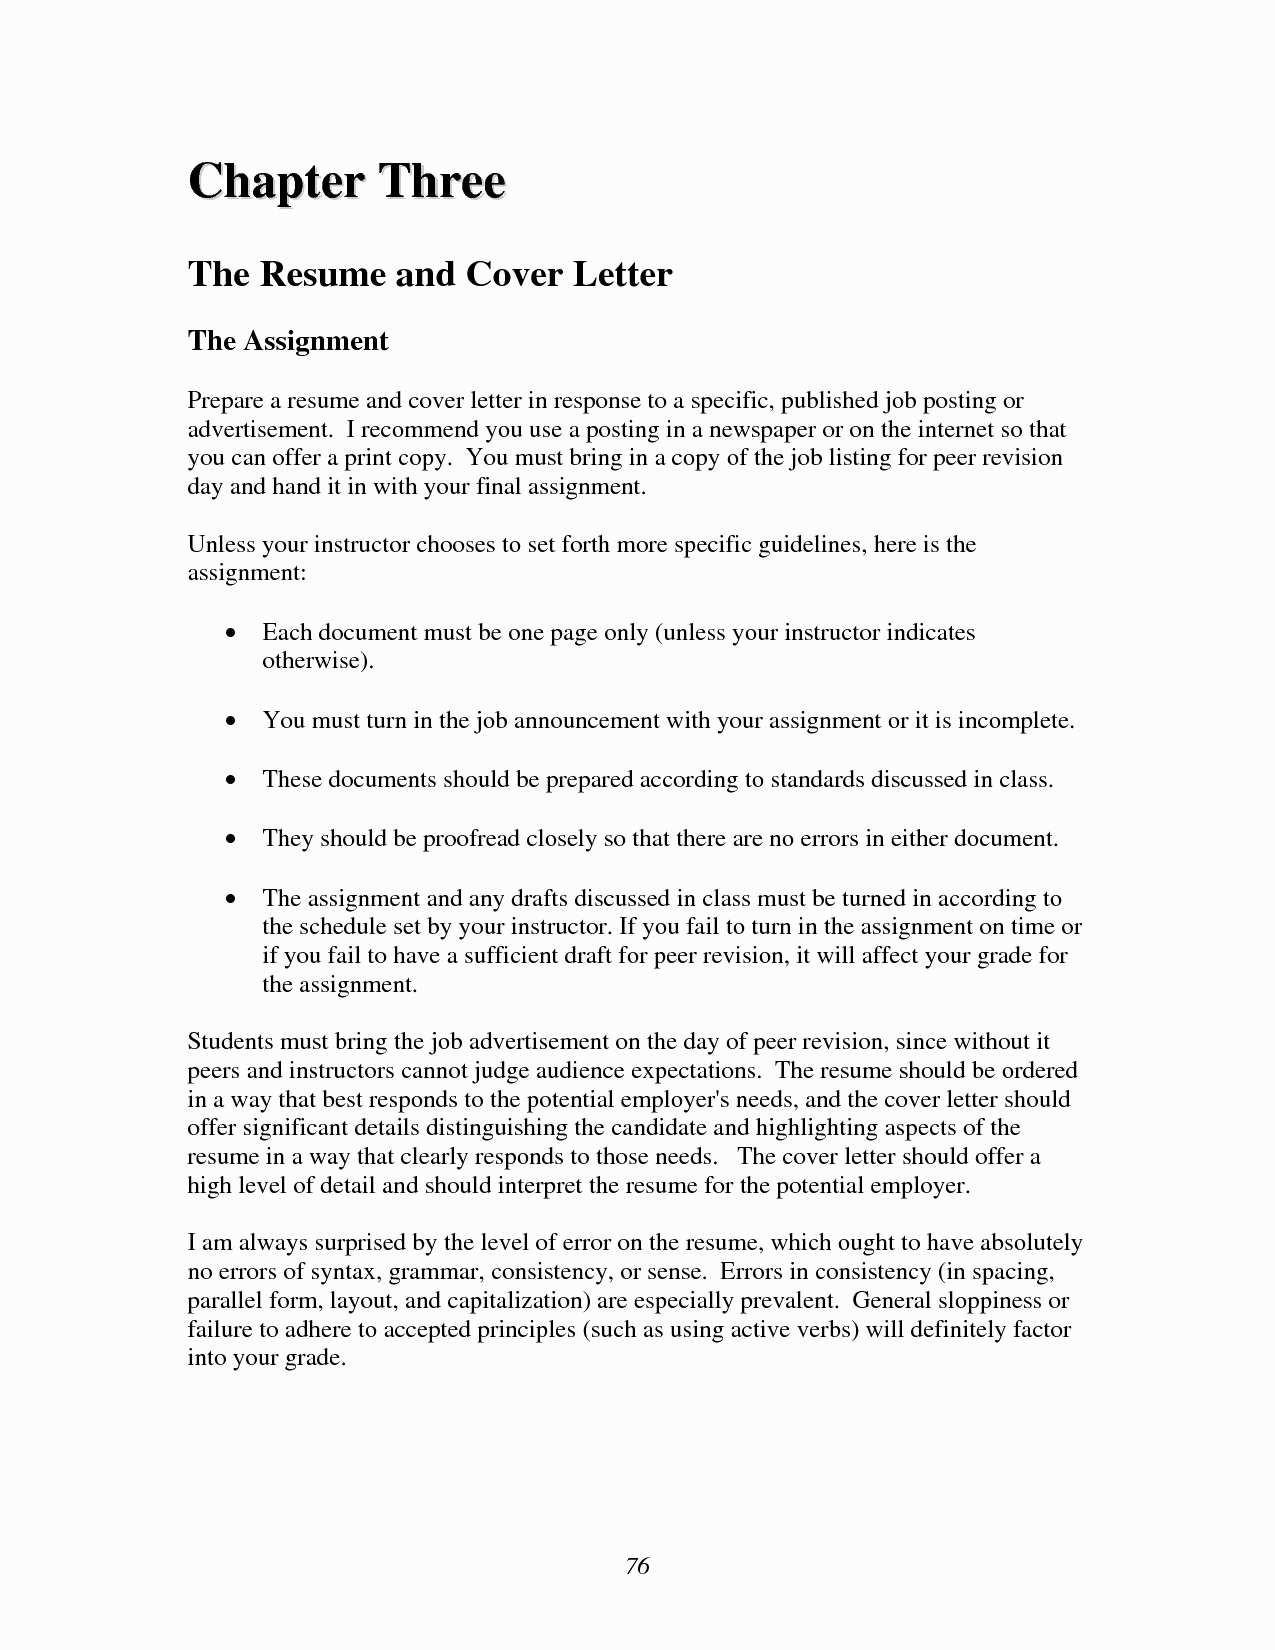 Employment fer Letter Template Samples